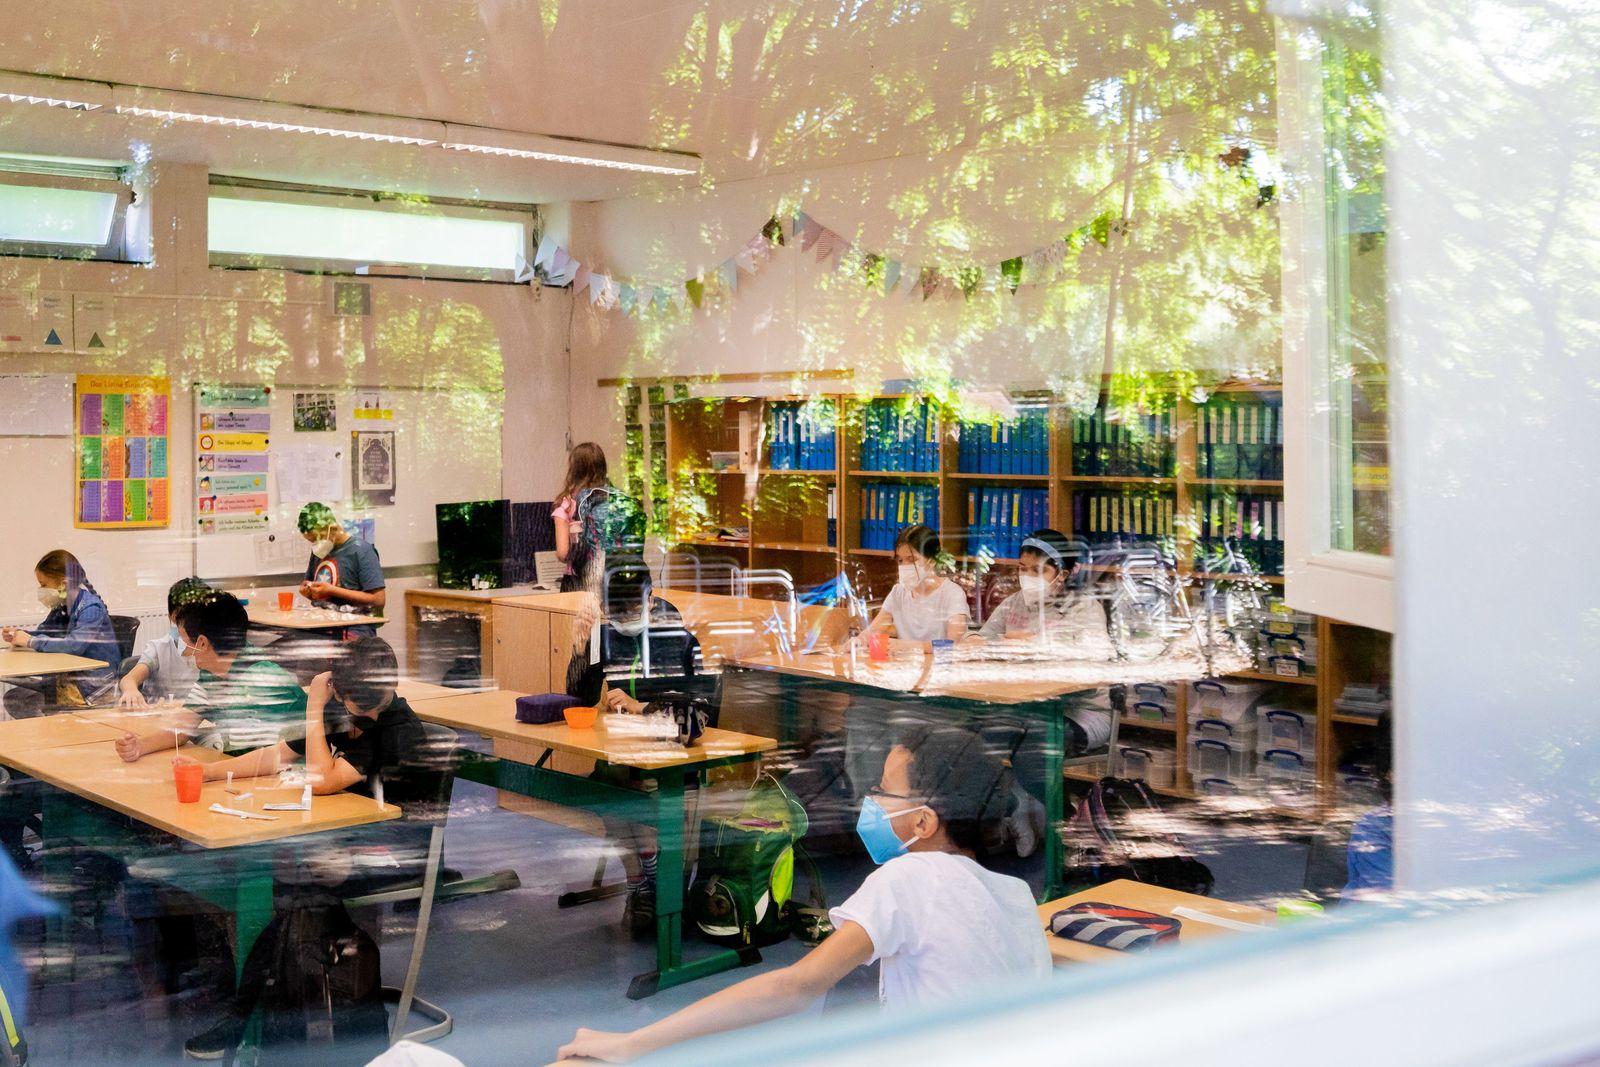 Coronavirus - Schulen in Berlin wieder im Regelbetrieb